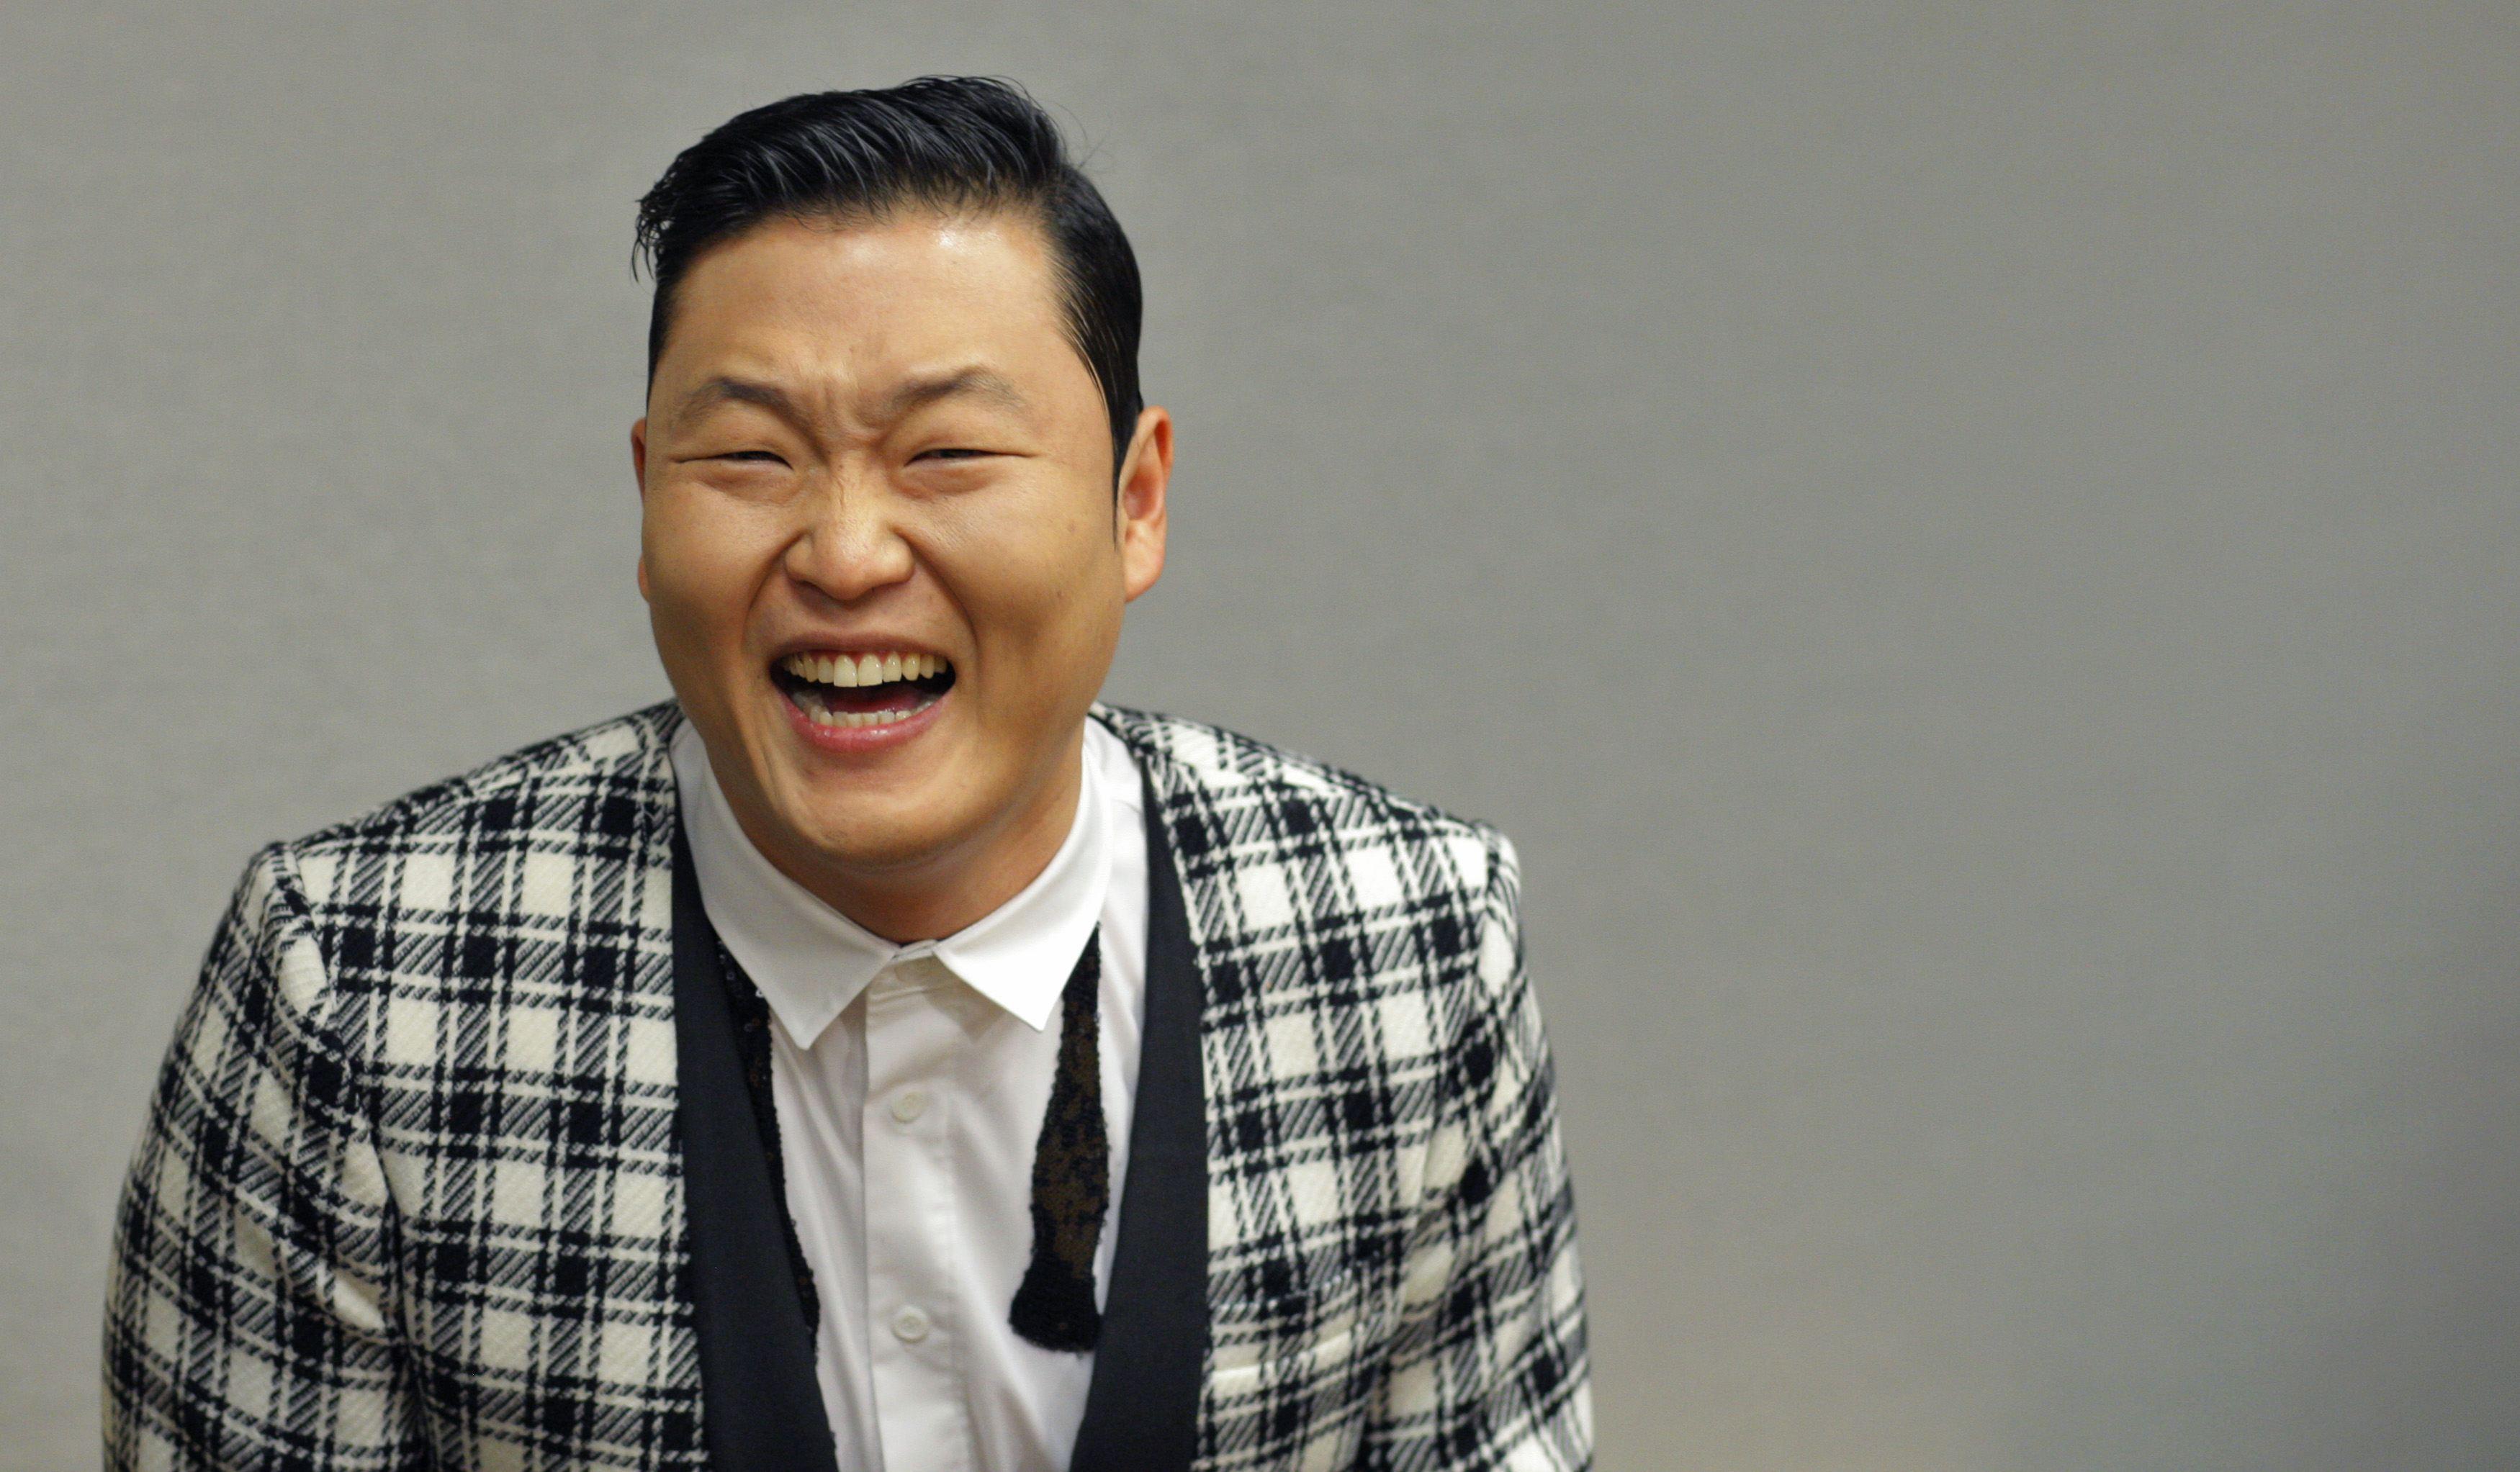 PSY gangnam style korean singer songwriter rapper dancer pop w wallpaper |  3500x2045 | 180898 | WallpaperUP